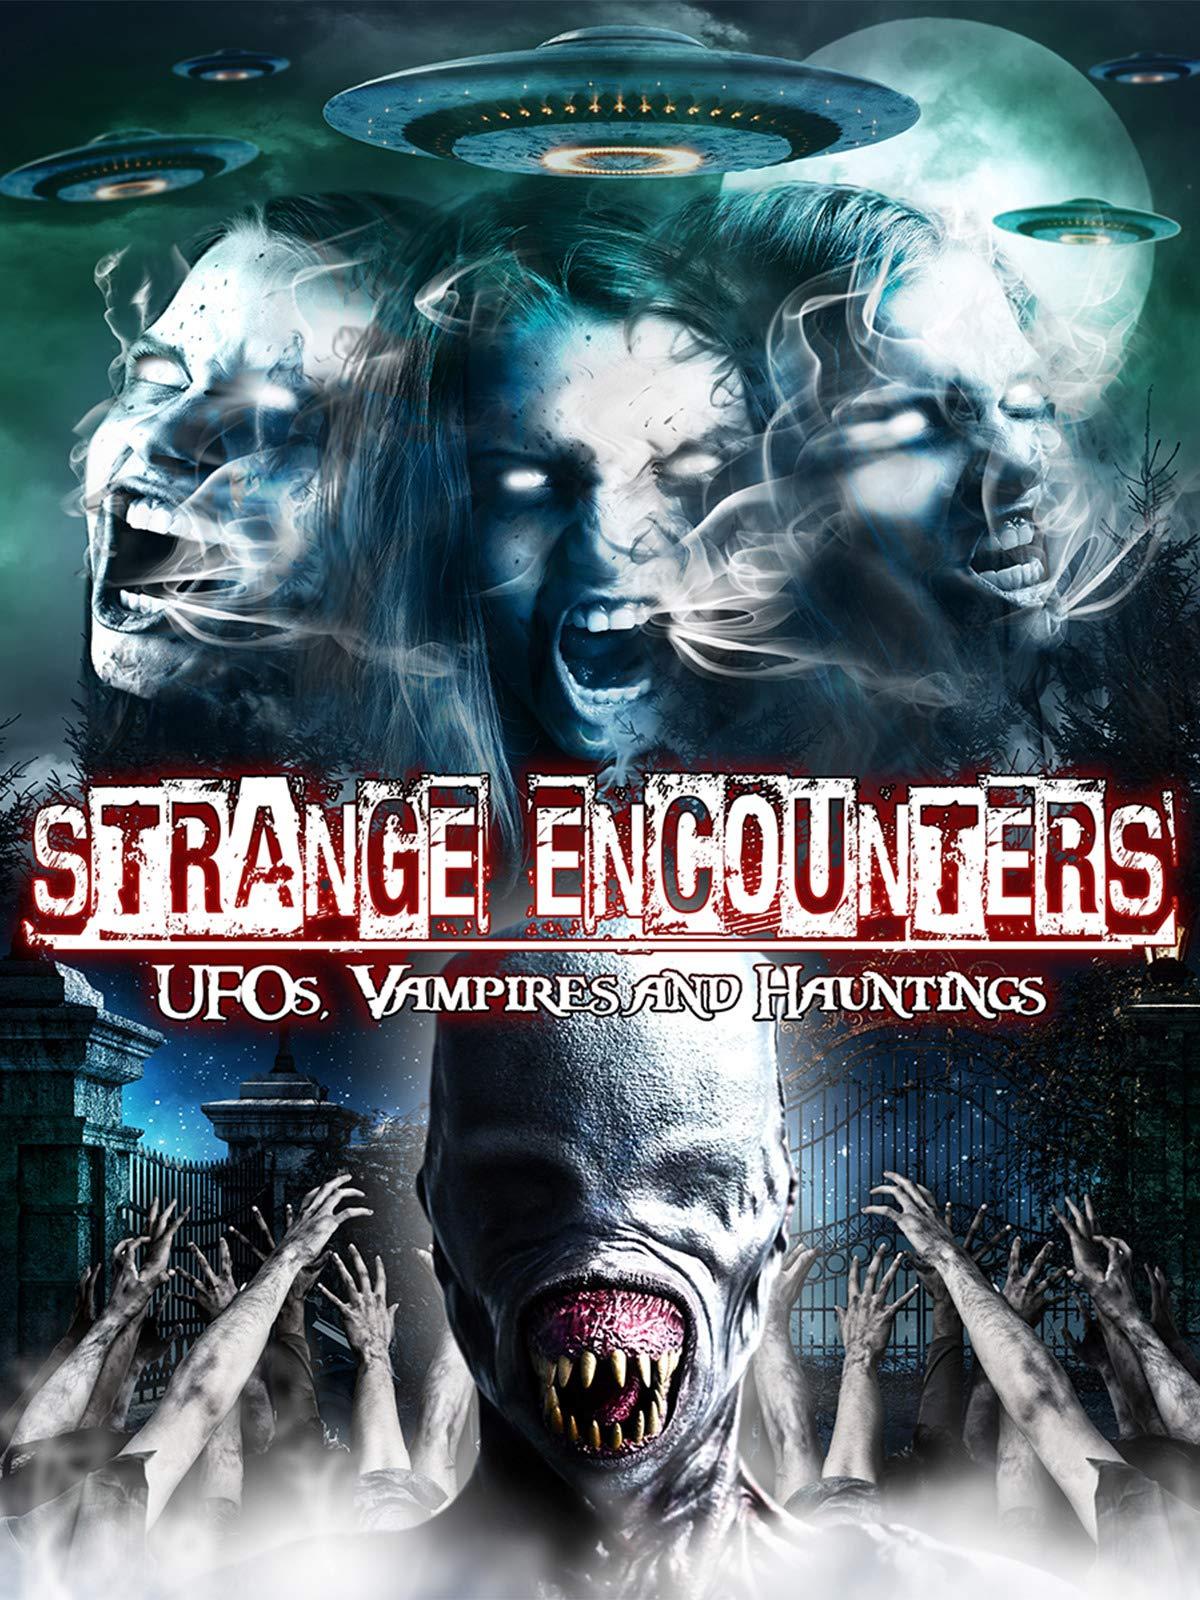 Strange Encounters, Vampires, UFOs and Hauntings on Amazon Prime Video UK